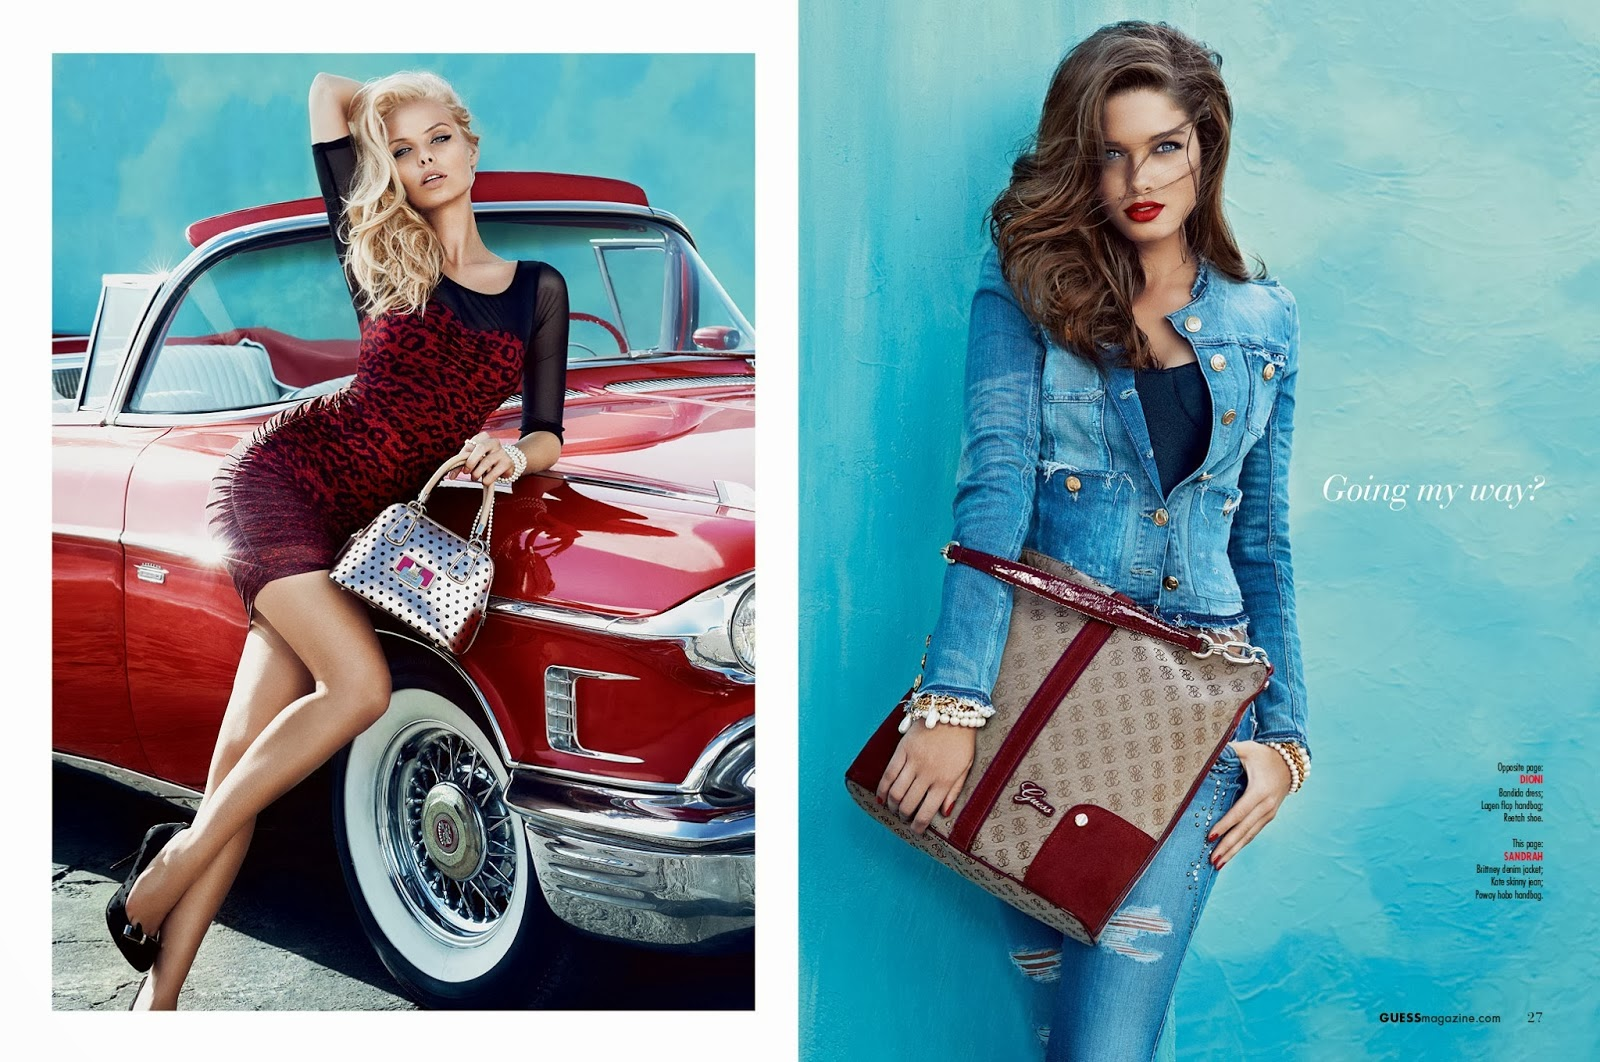 2014 Guess elbise modelleri, 2014 elbise modelleri, elbise modelleri, uzun elbise, kısa elbise, deri elbise, şifon elbise, pilili elbise